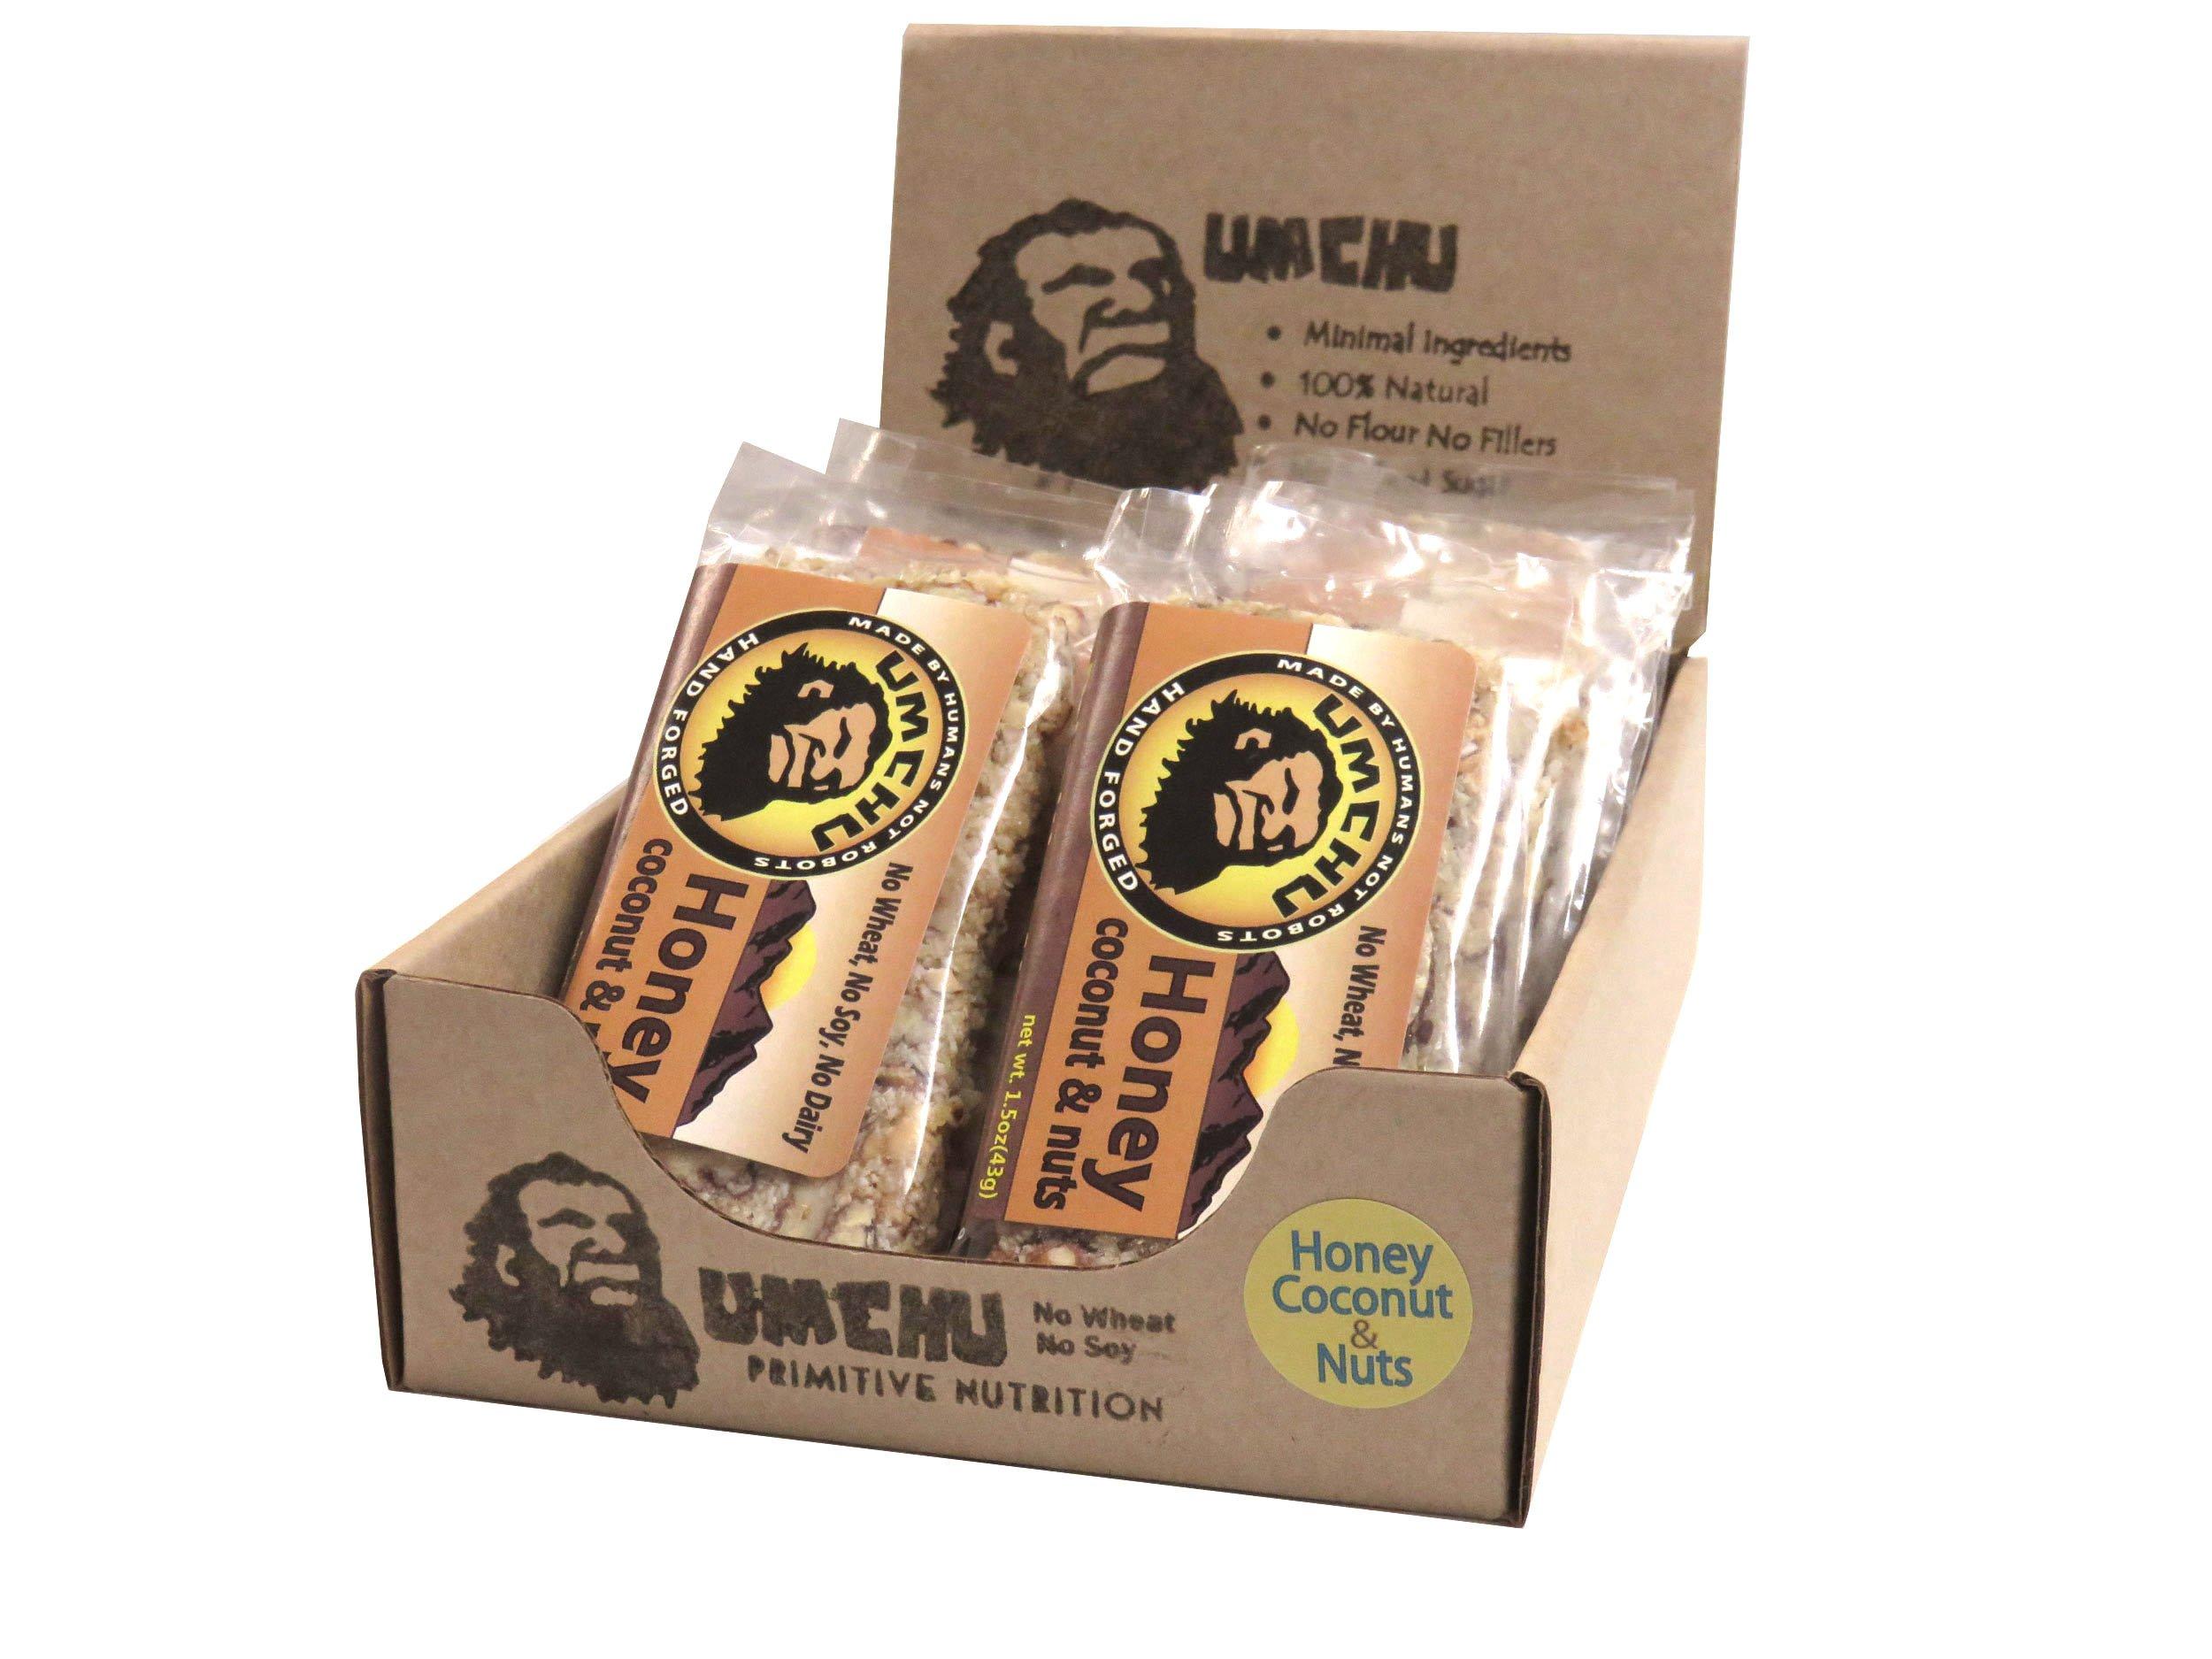 Honey Coconut & Nuts Umchu Bar (Box of 12) Paleo, Gluten Free, Dairy Free